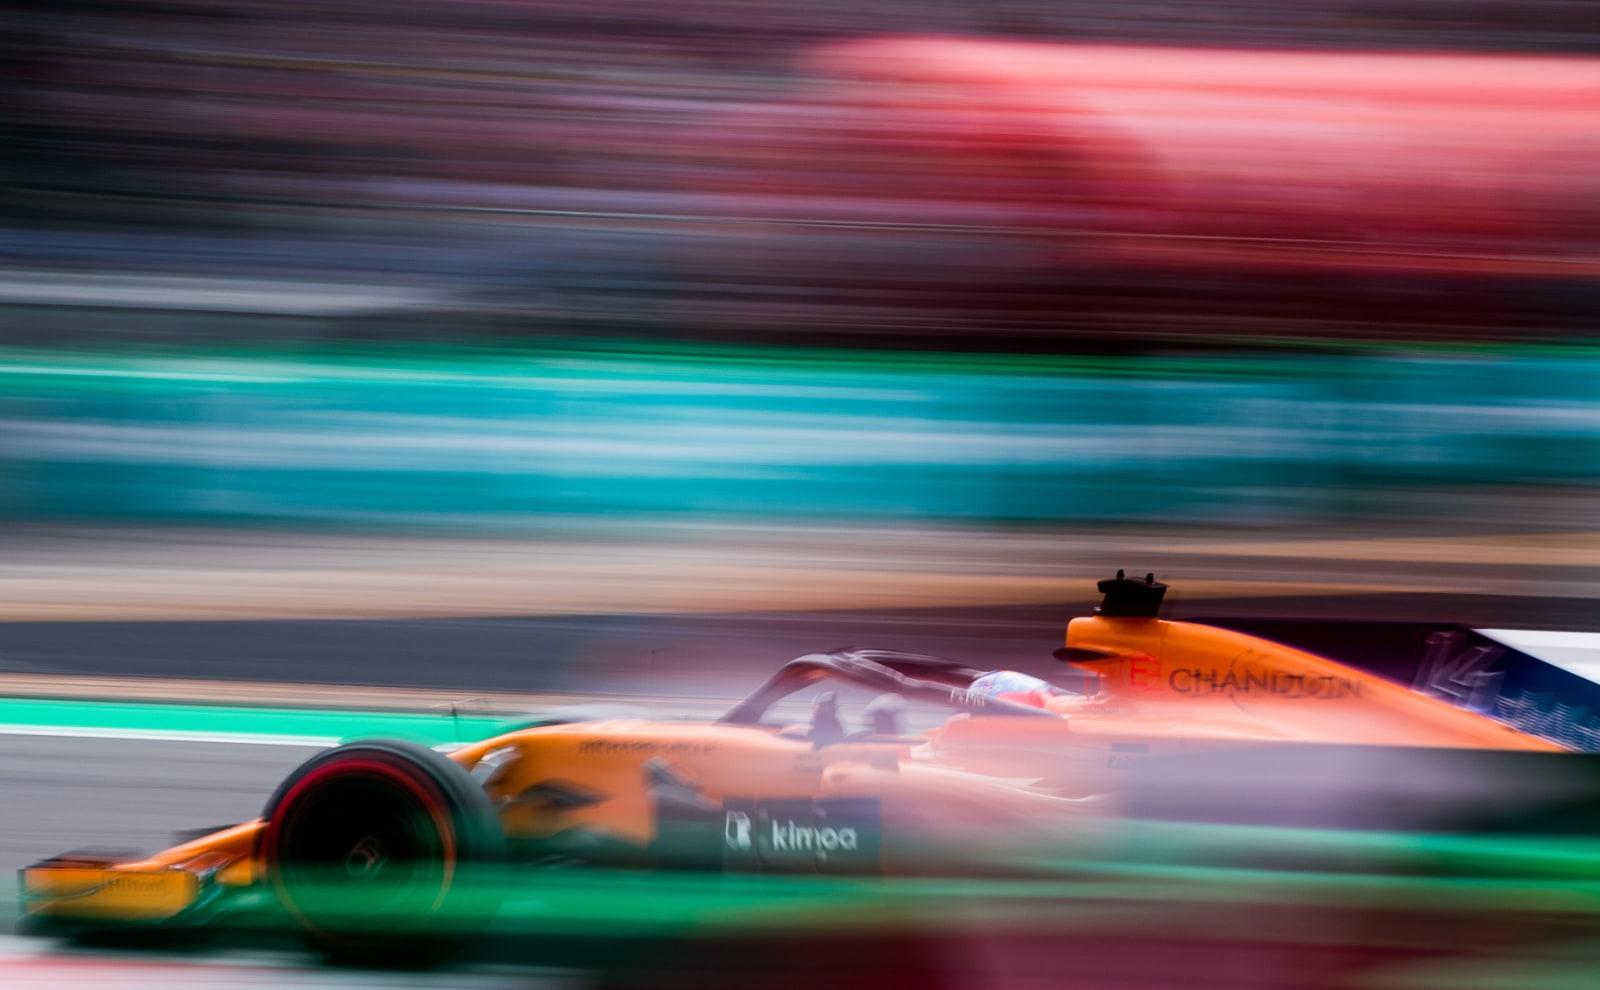 Fernando Alonso in McLaren F1 car during 2018 Italian Grand Prix